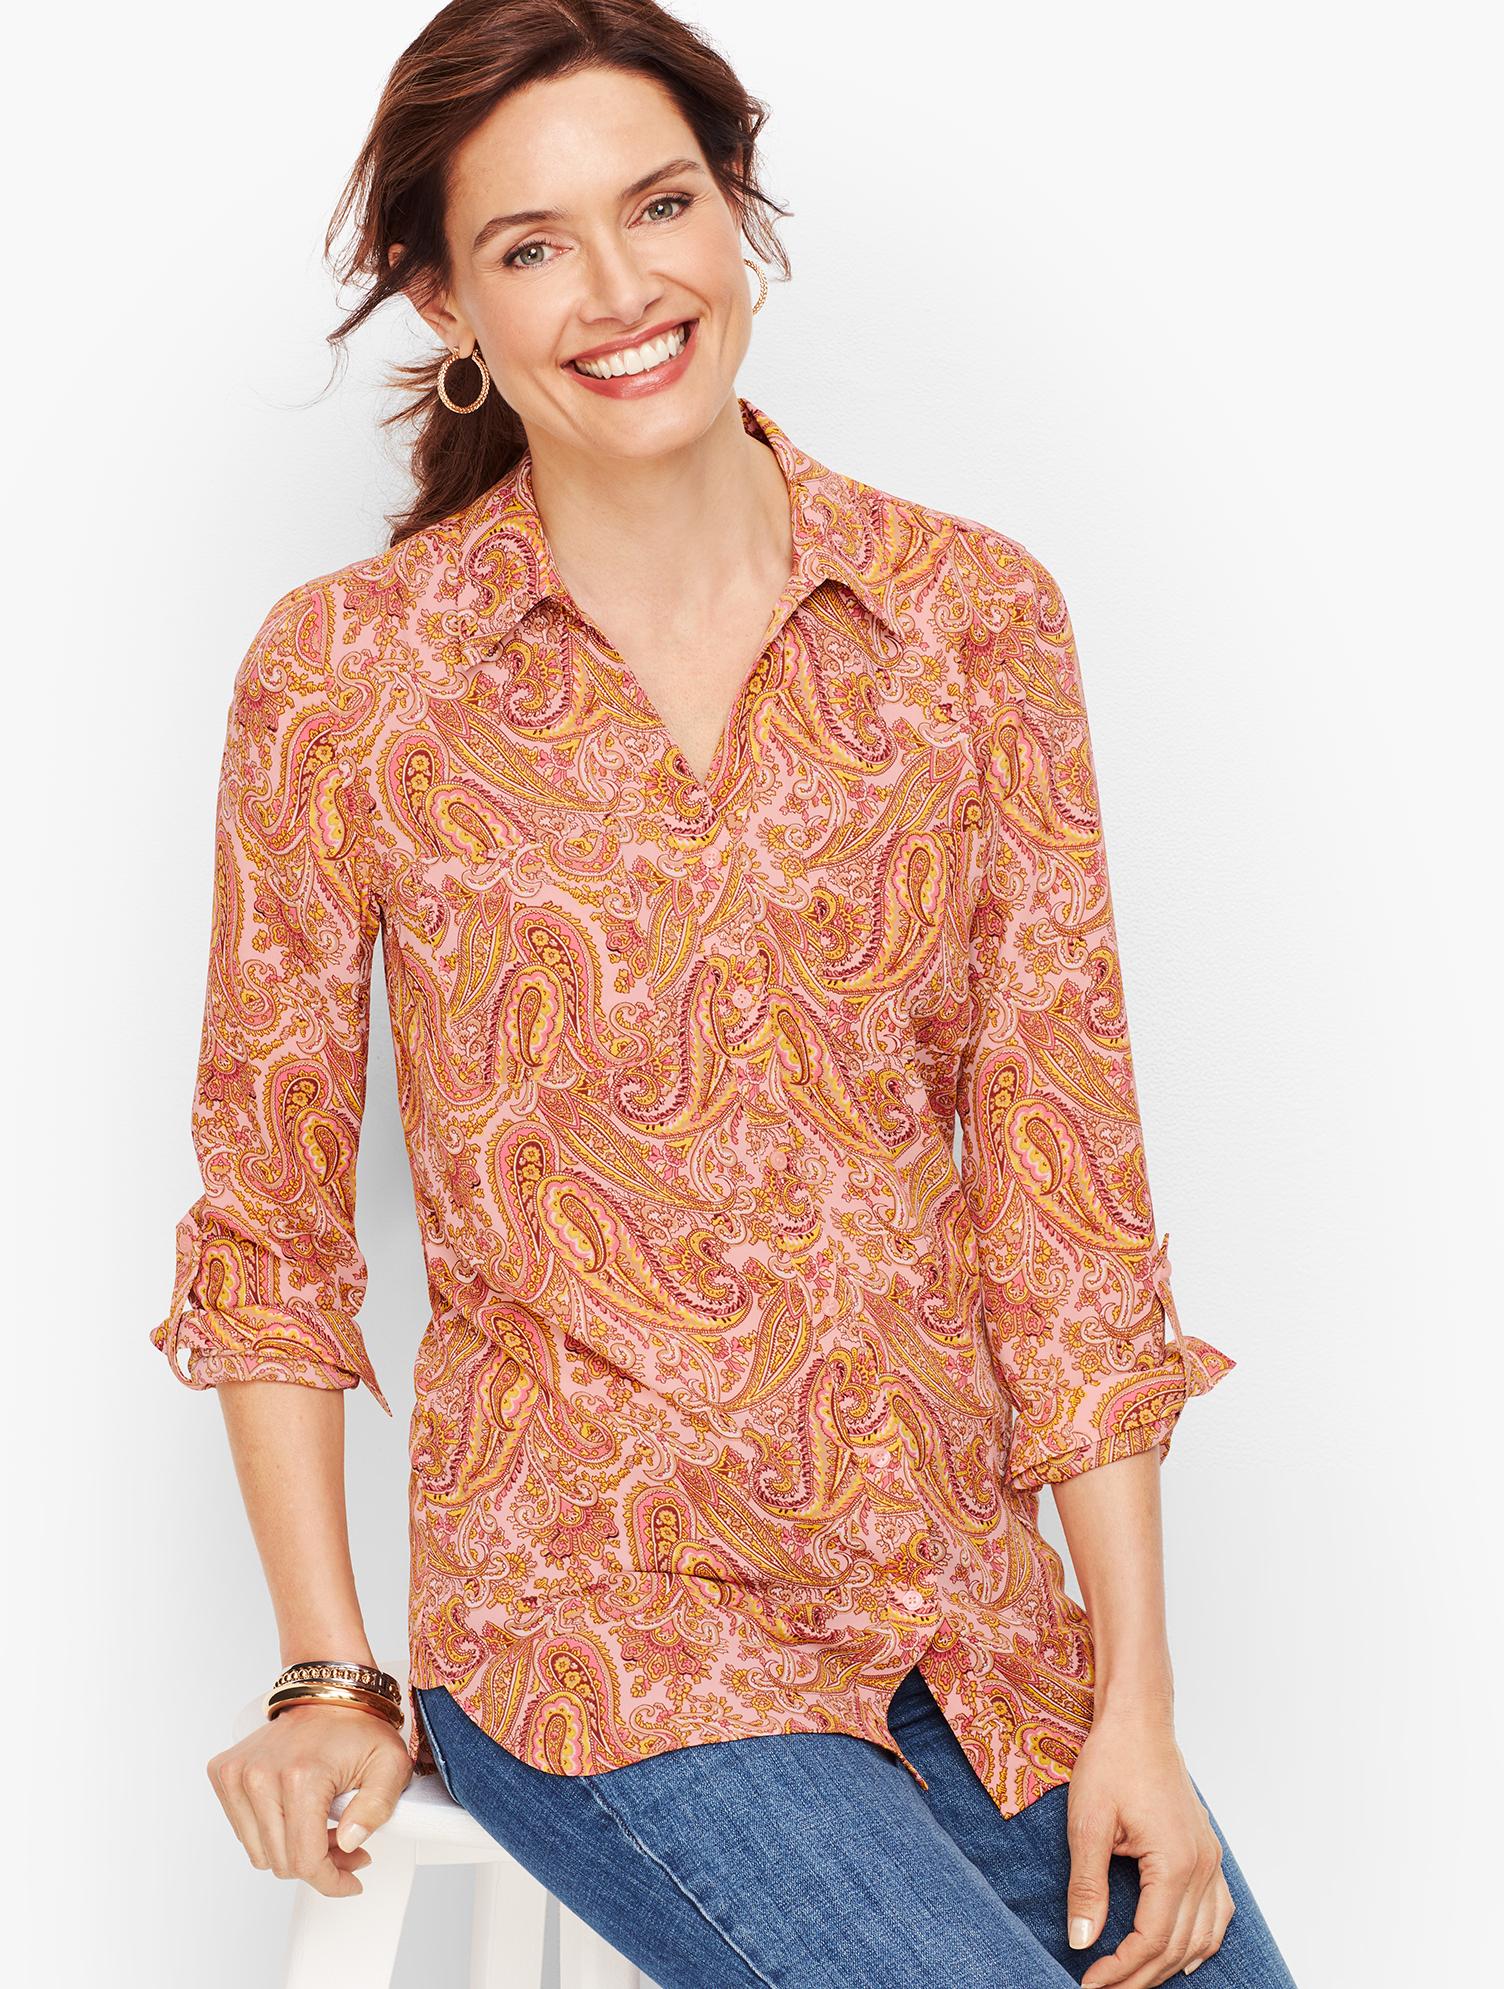 60s Shirts, T-shirt, Blouses, Hippie Shirts Soft Shirt - Paisley - BALLET-SLIPPERS - XL - Talbots $62.65 AT vintagedancer.com